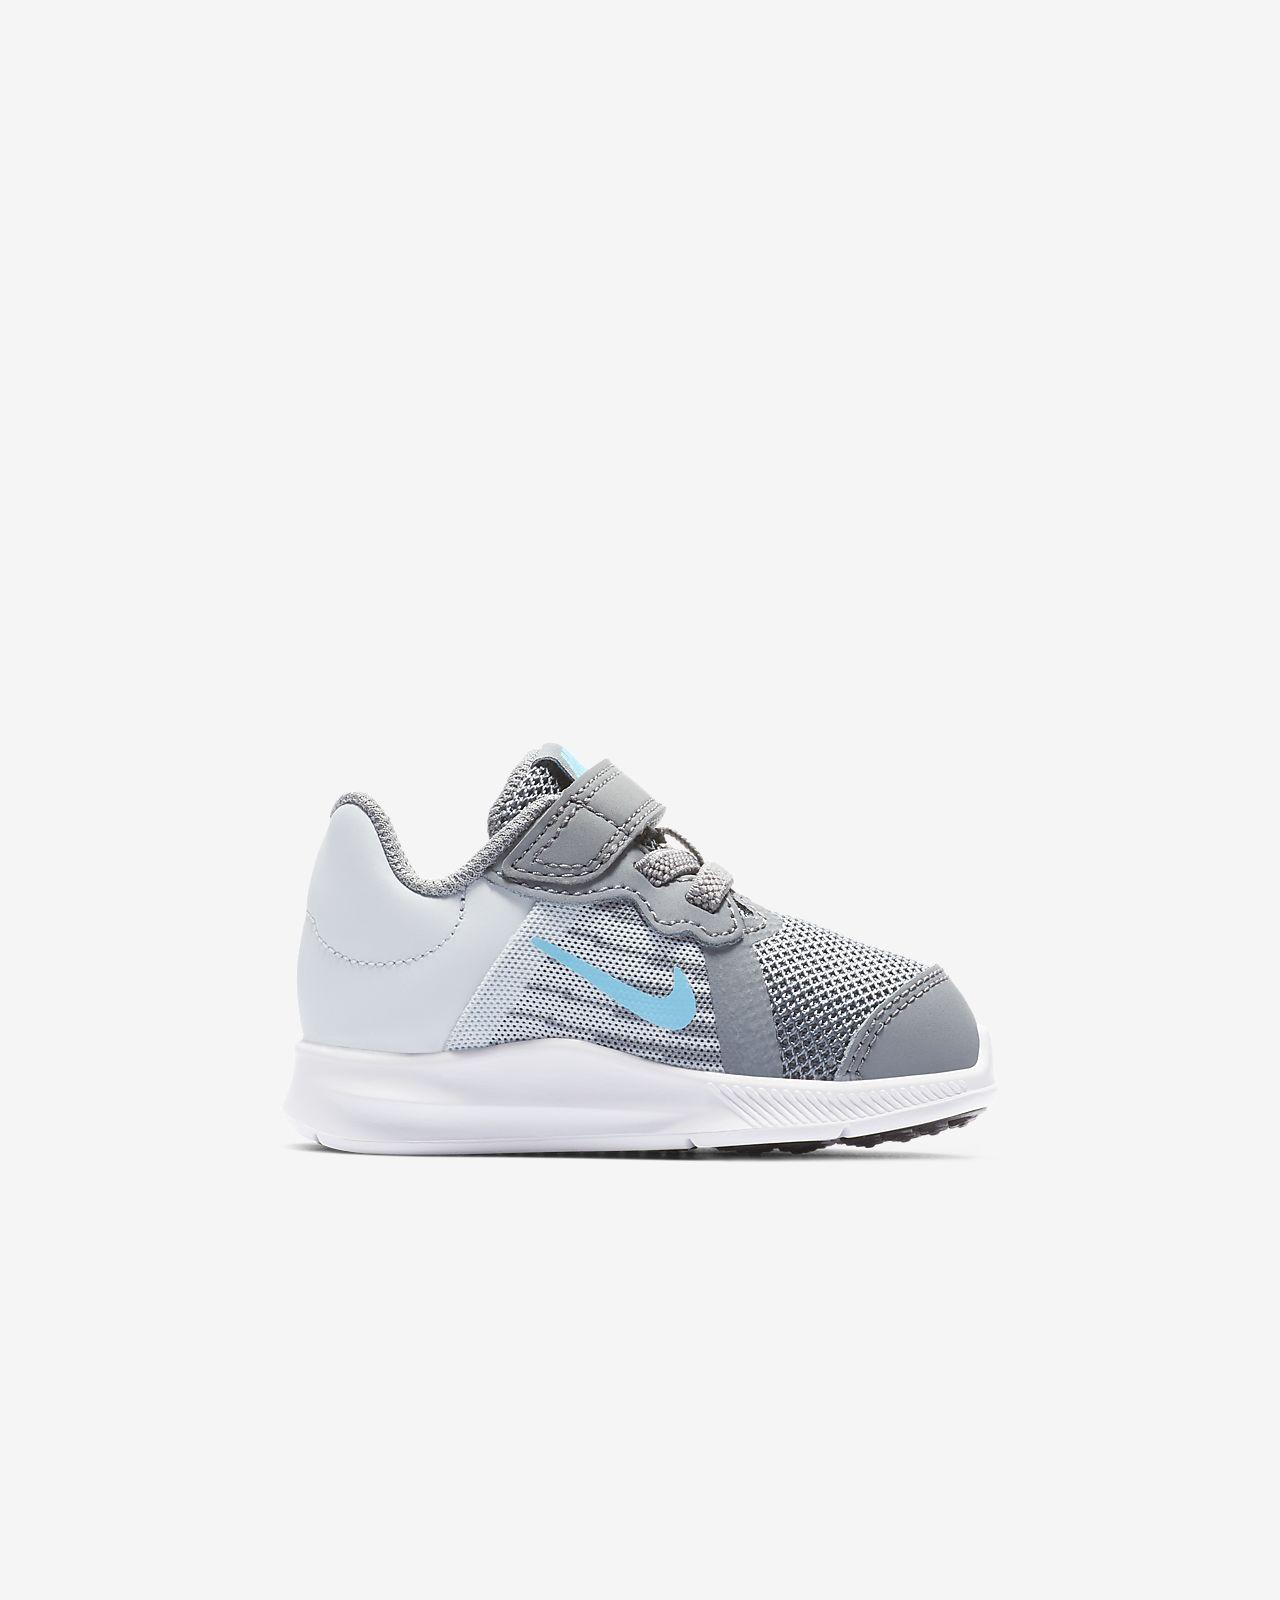 2868e71307 Nike Downshifter 8 Baby   Toddler Shoe. Nike.com AU